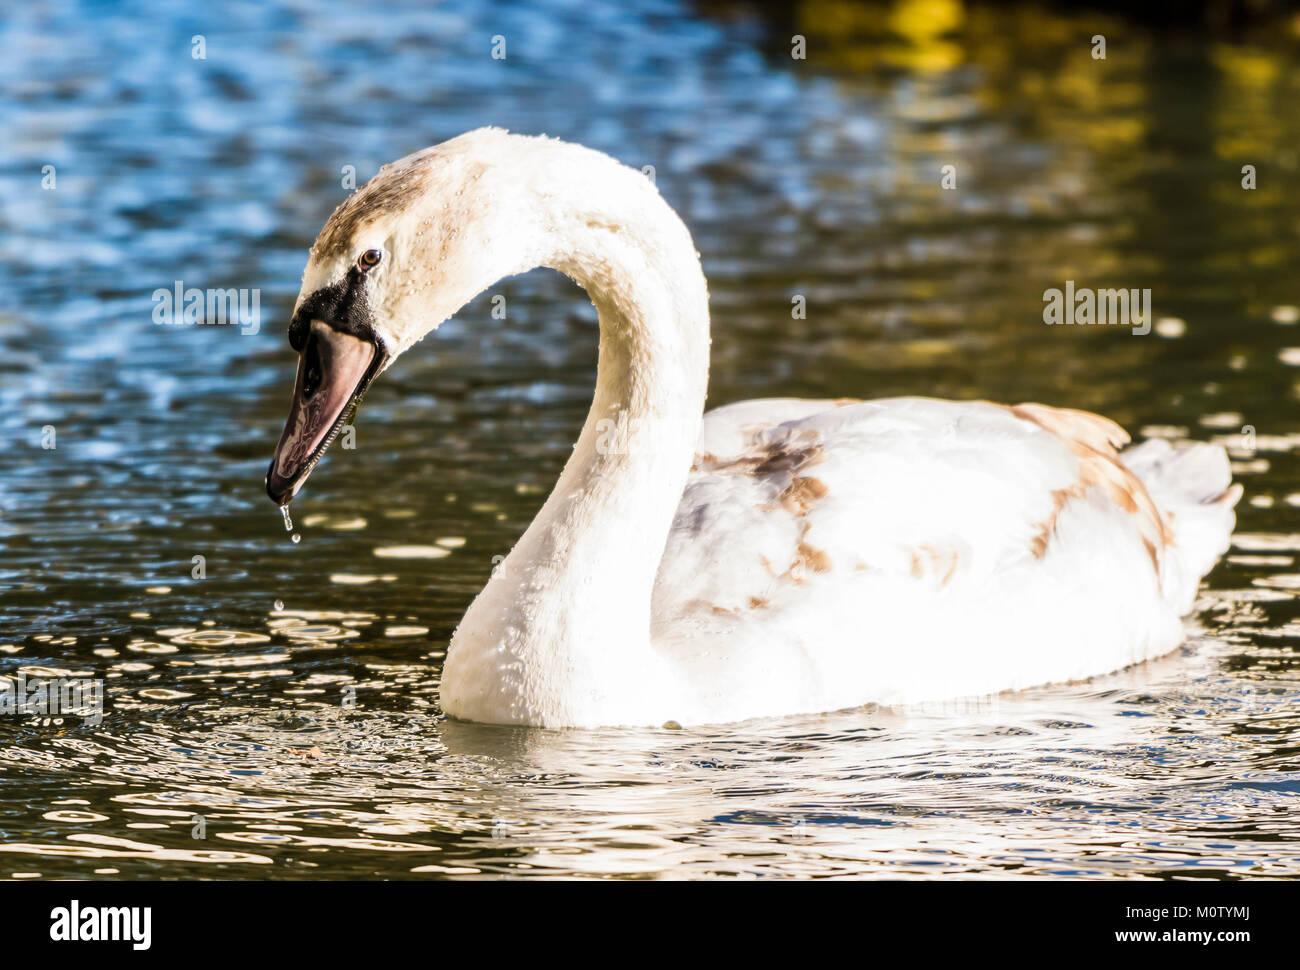 Mute swan auf die Octagon See, Stowe, Buckinghamshire, Großbritannien Stockfoto